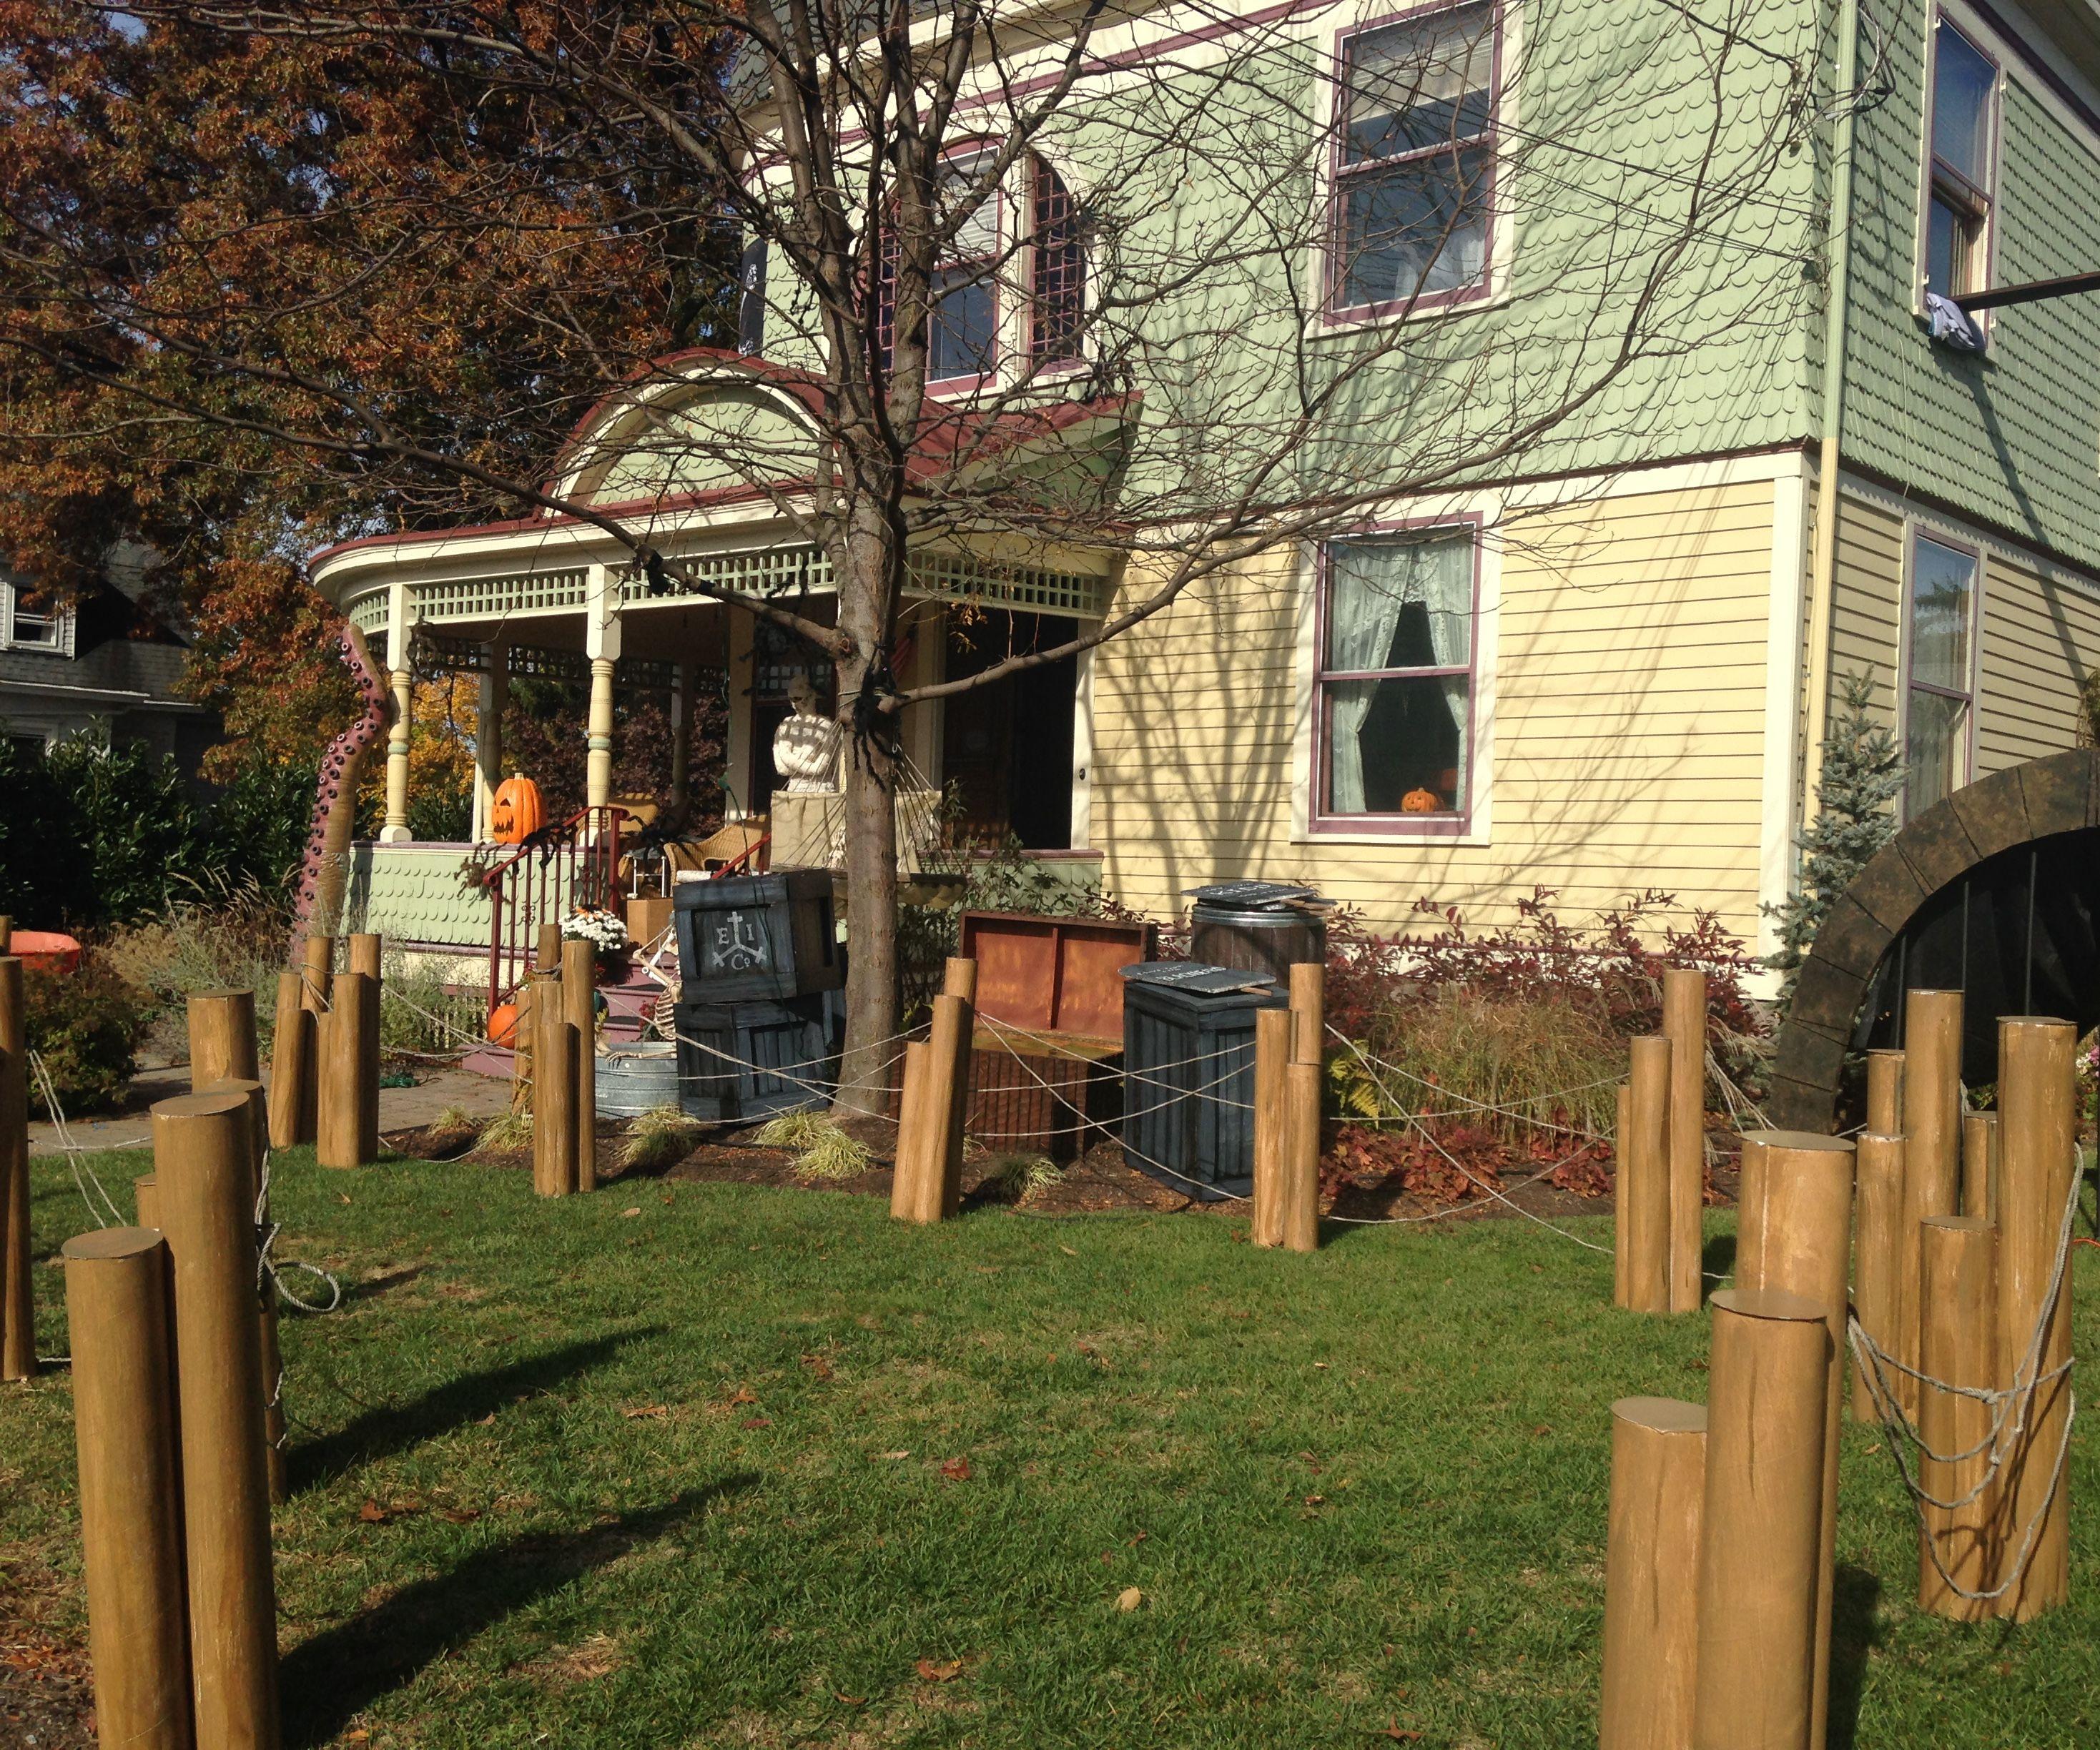 CardBoard Dock Pilings for Halloween Fence